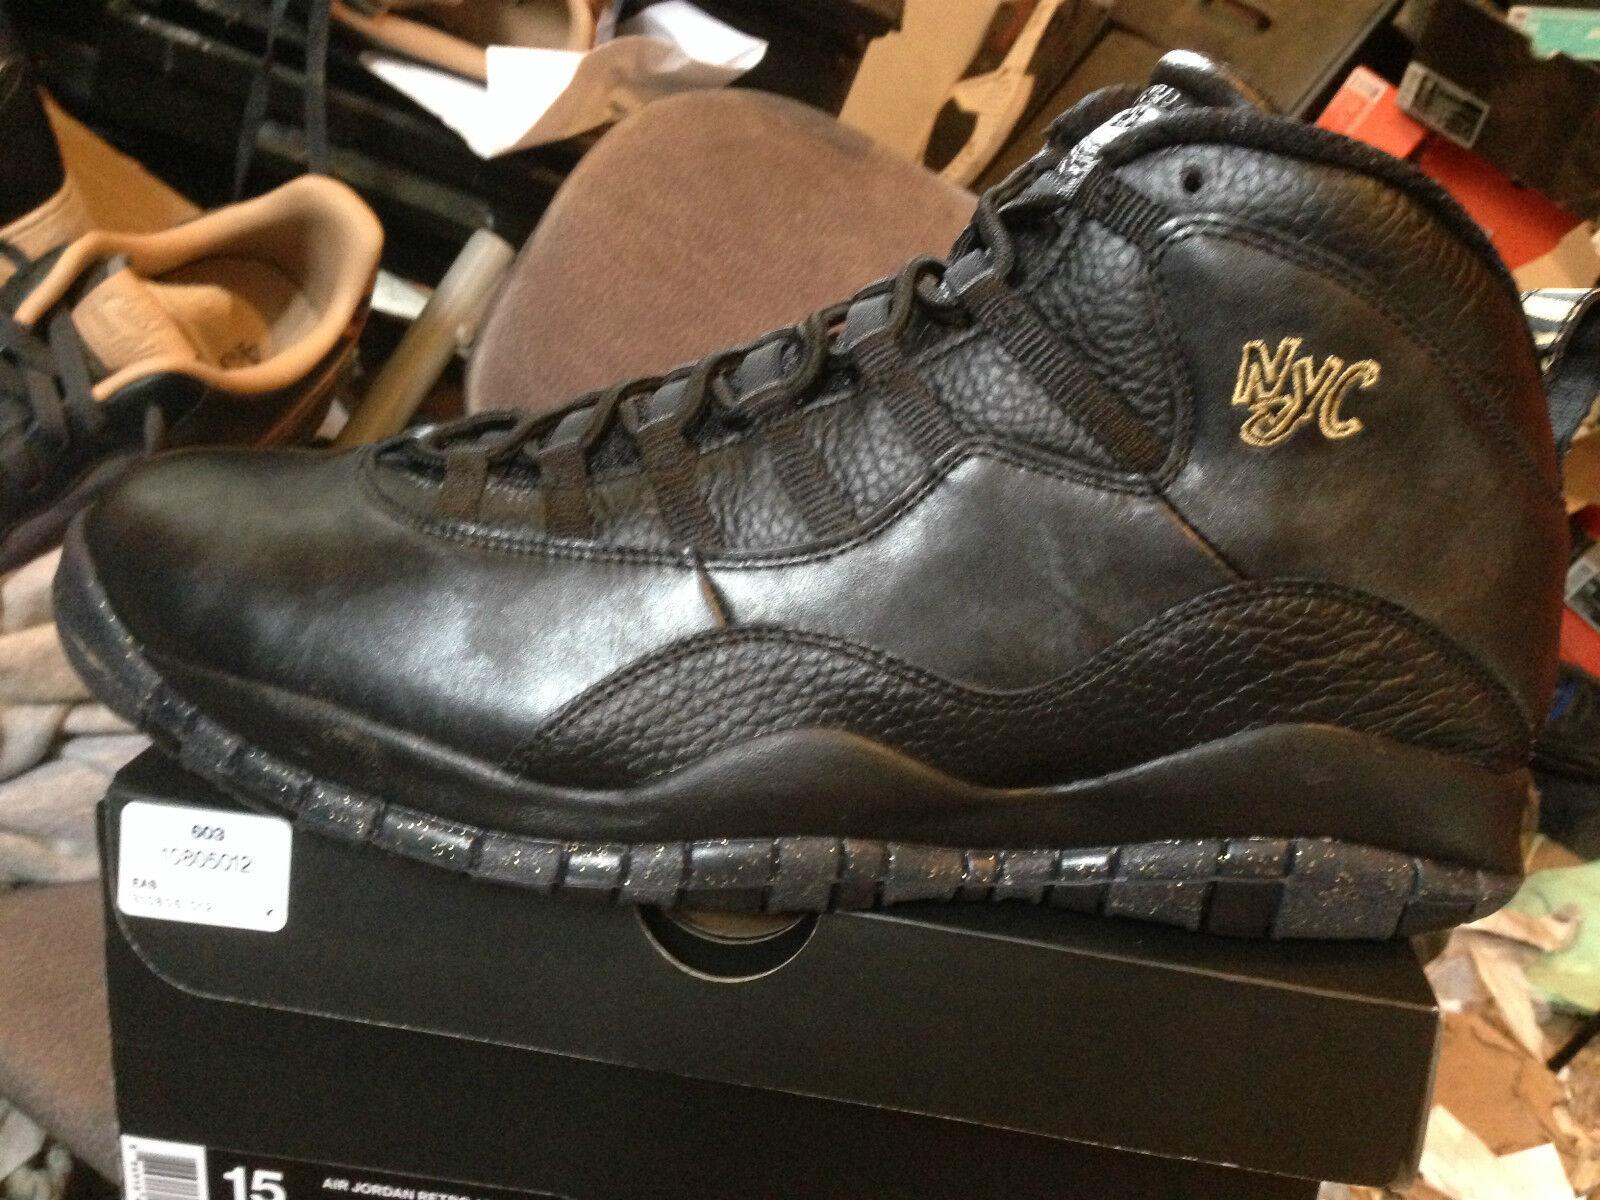 Nike air jordan retrò 10 new york bnib blk / blk / gry numero 15